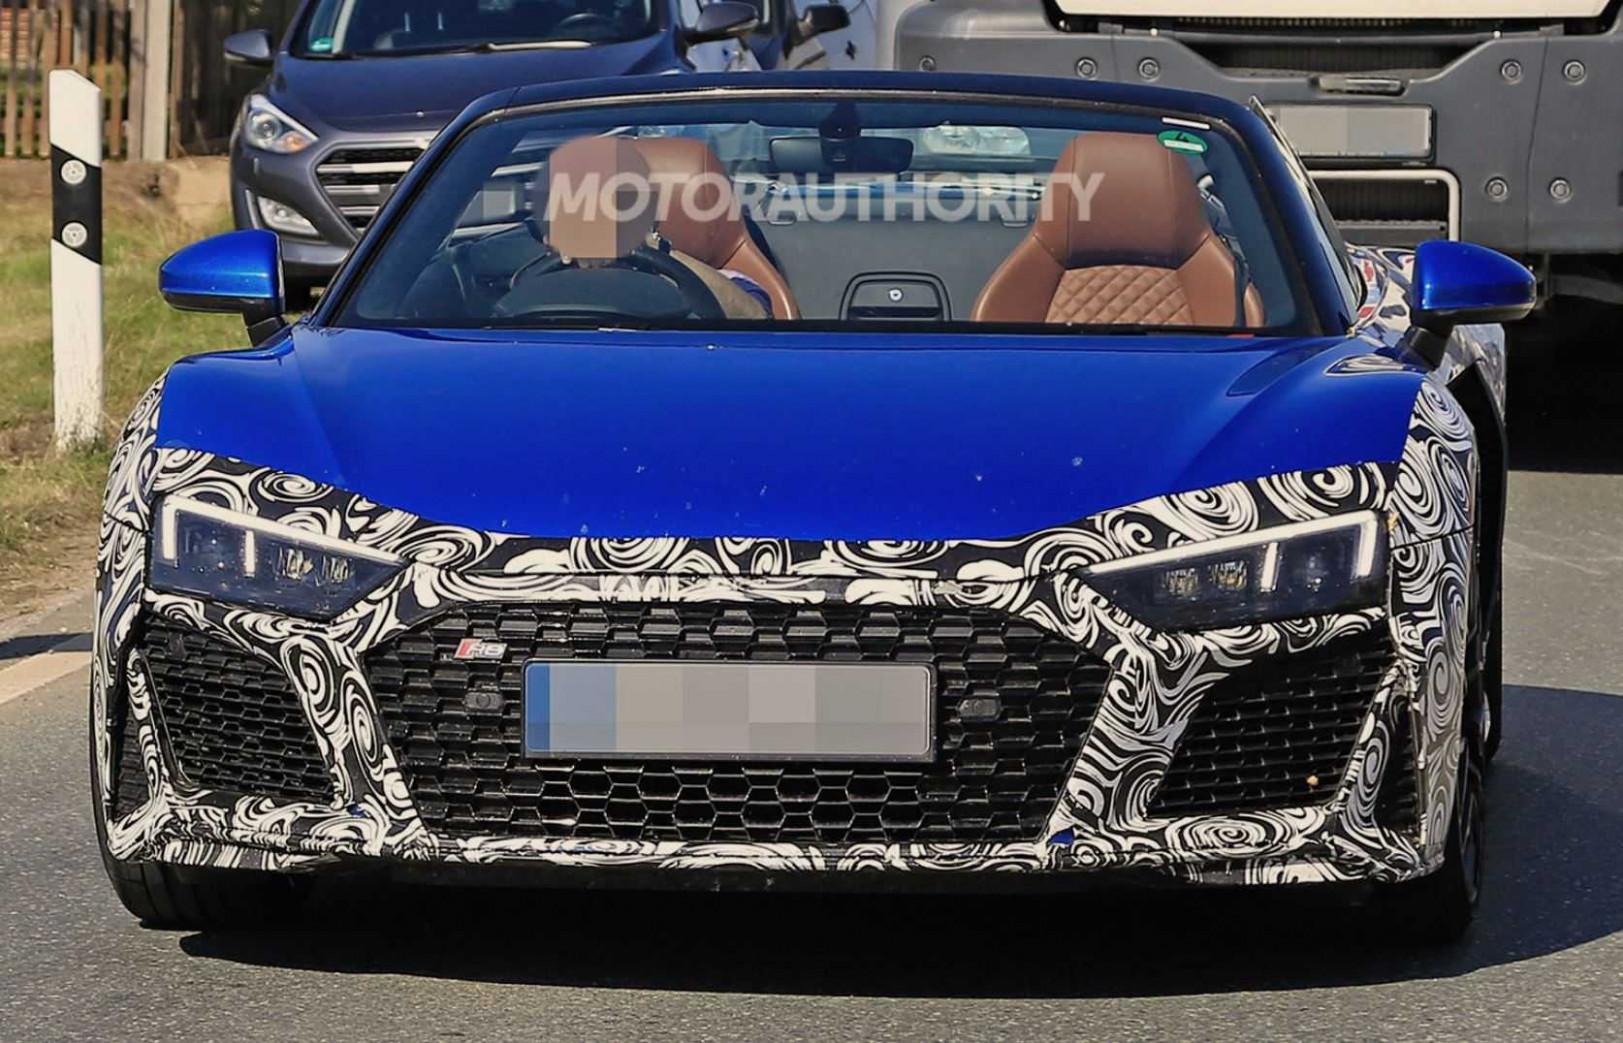 Photos 2022 Audi R8 V10 Spyder